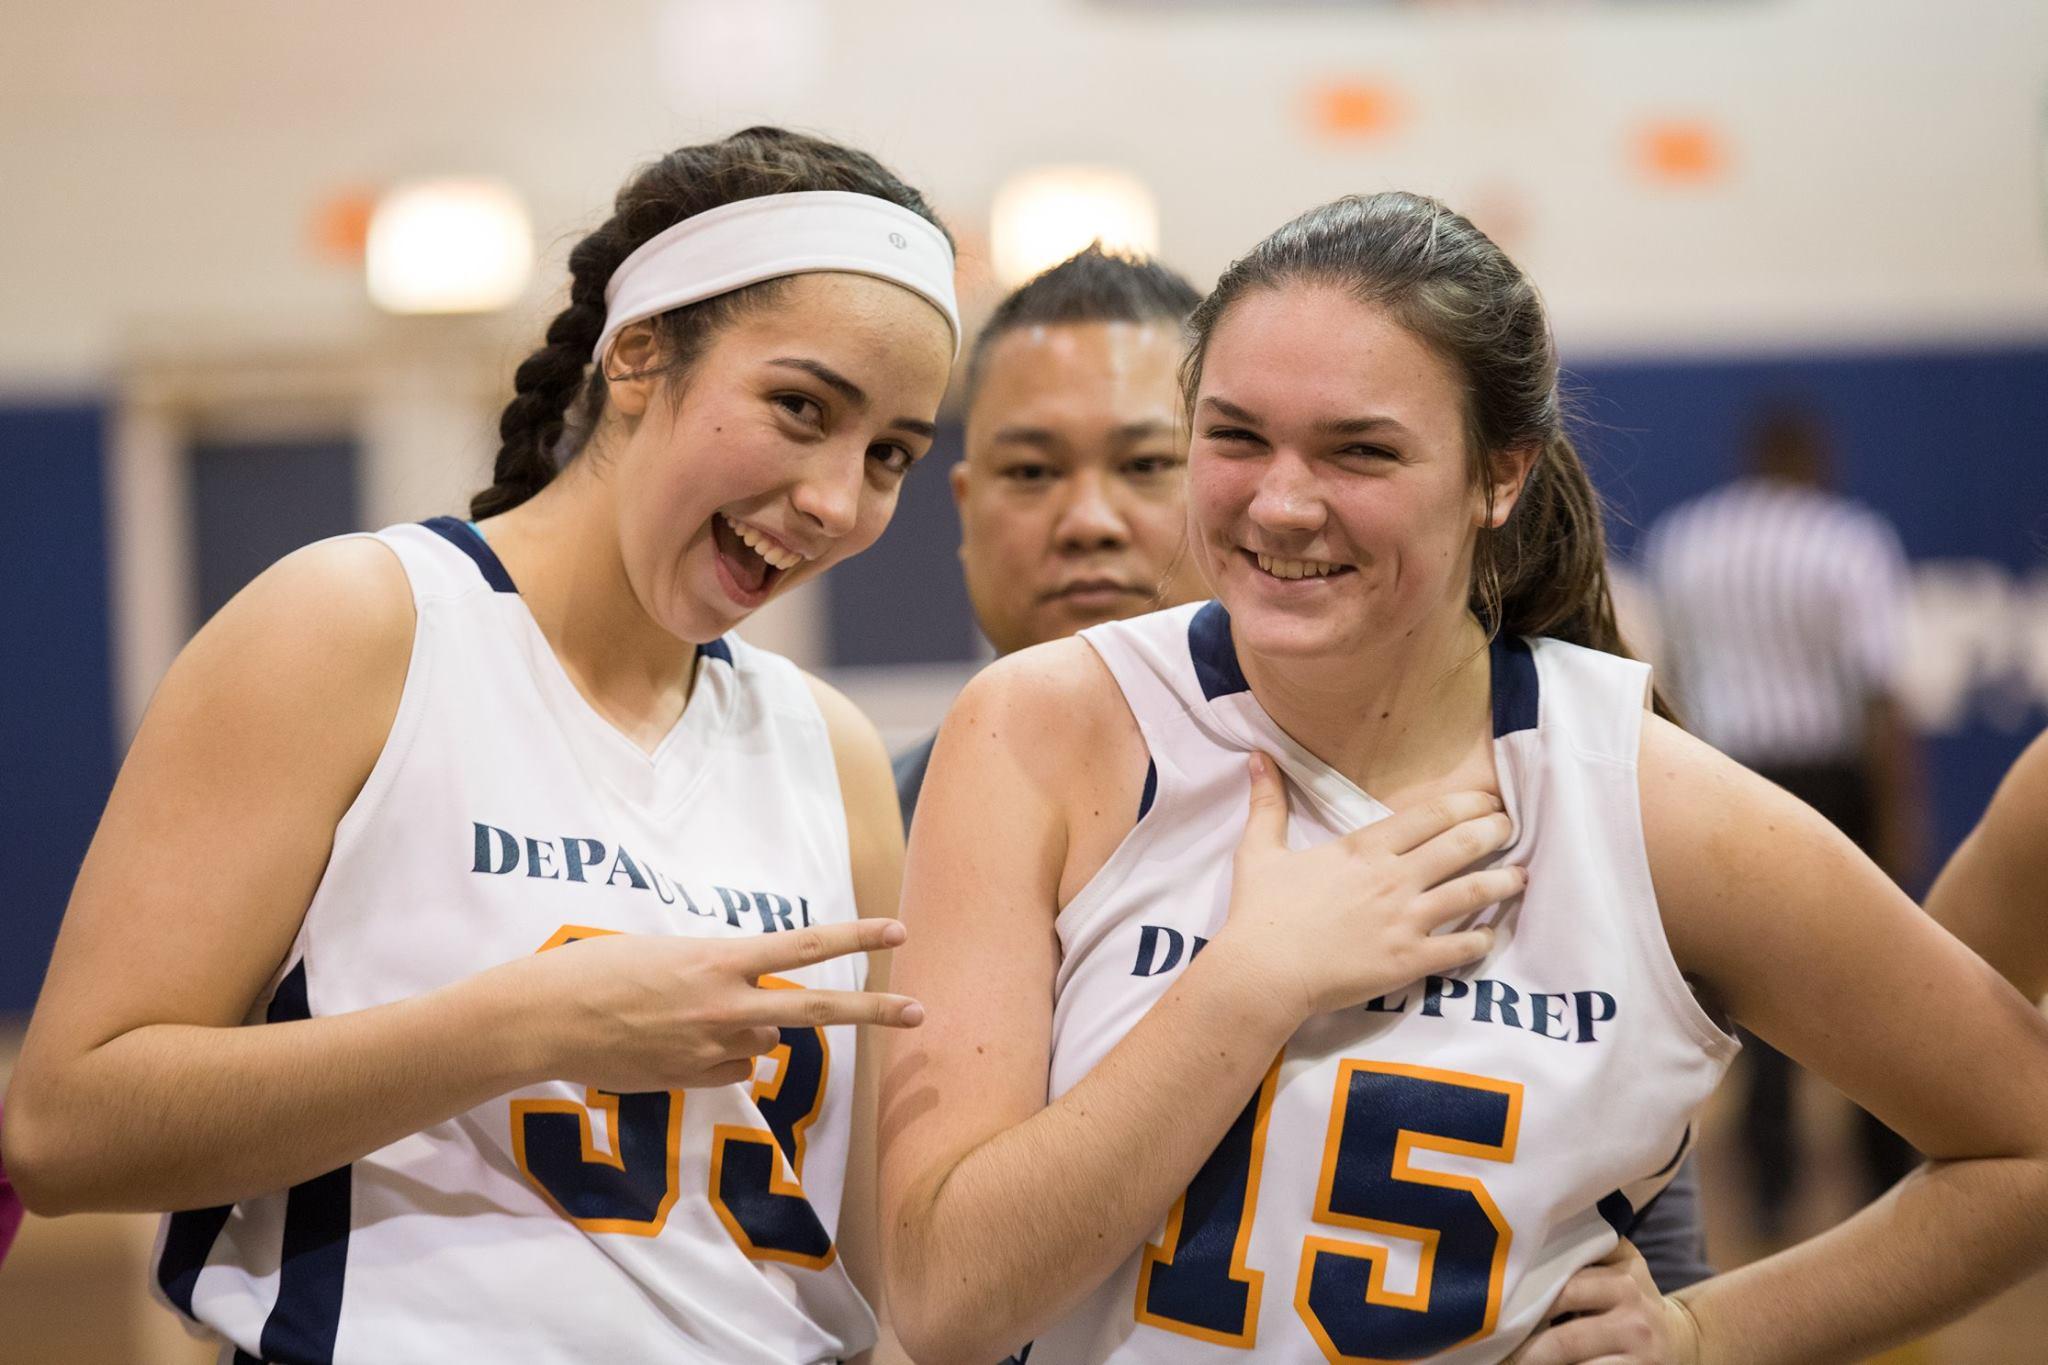 Girls Basketball - DePaul College Prep